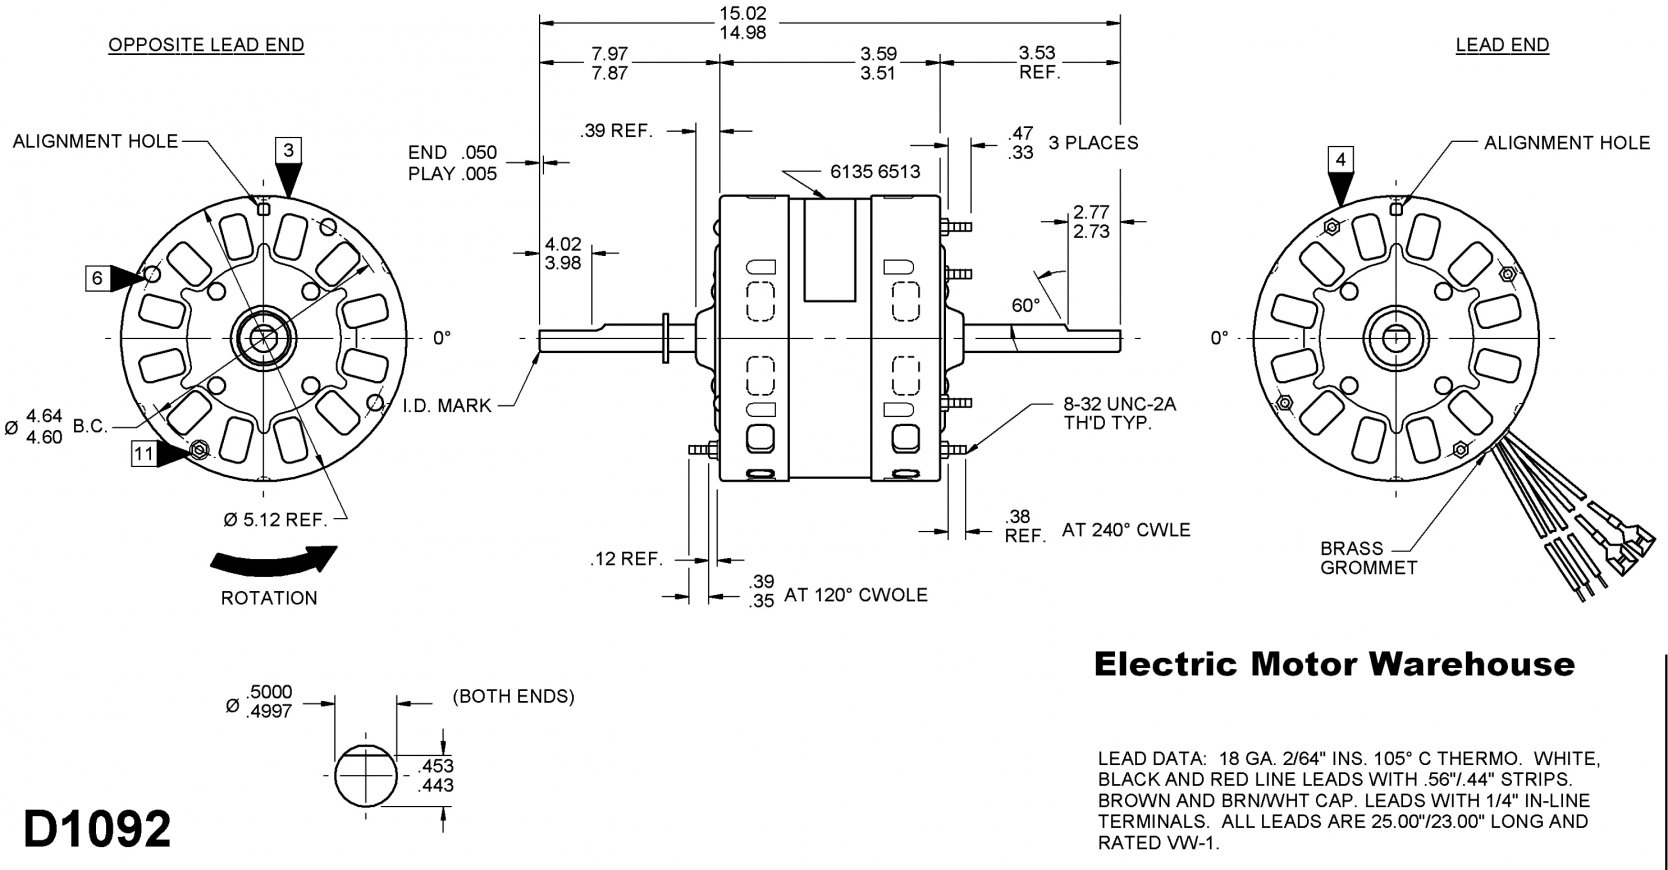 115230 Volt Electric Motor Wiring Diagram | Wiring Diagram - Century Ac Motor Wiring Diagram 115 230 Volts